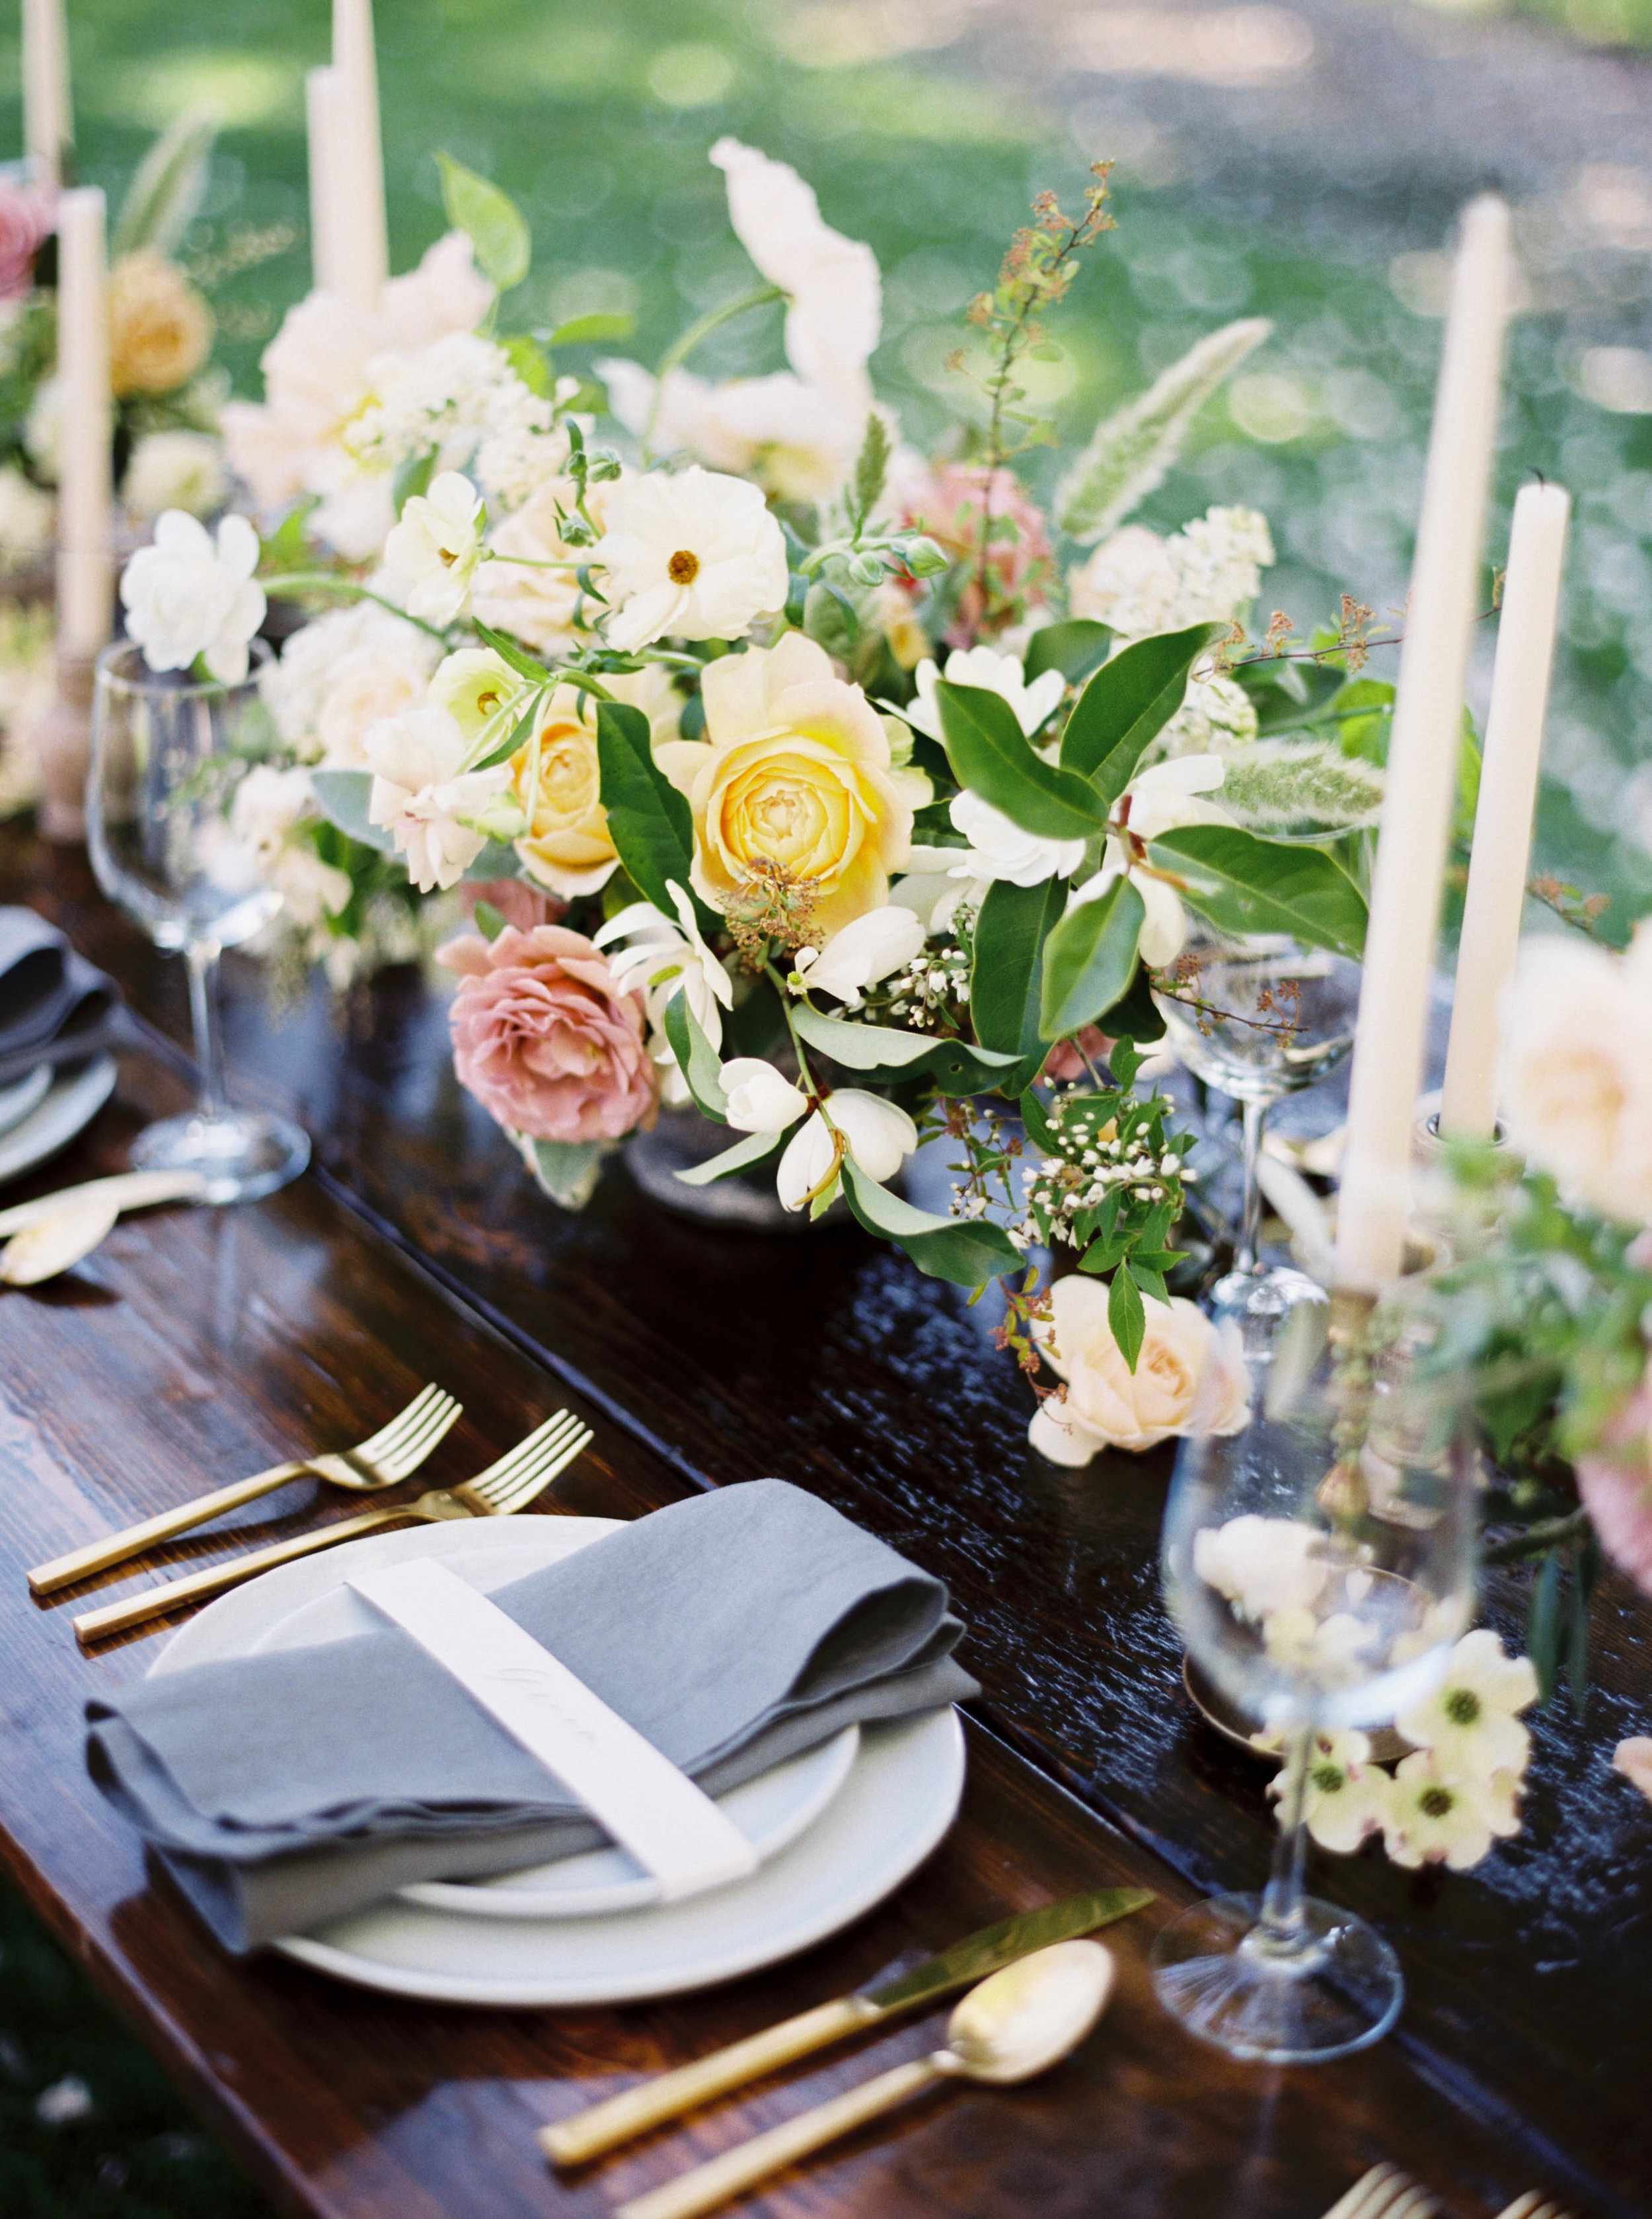 spring wedding table centerpiece for hood river, OR wedding .jpg